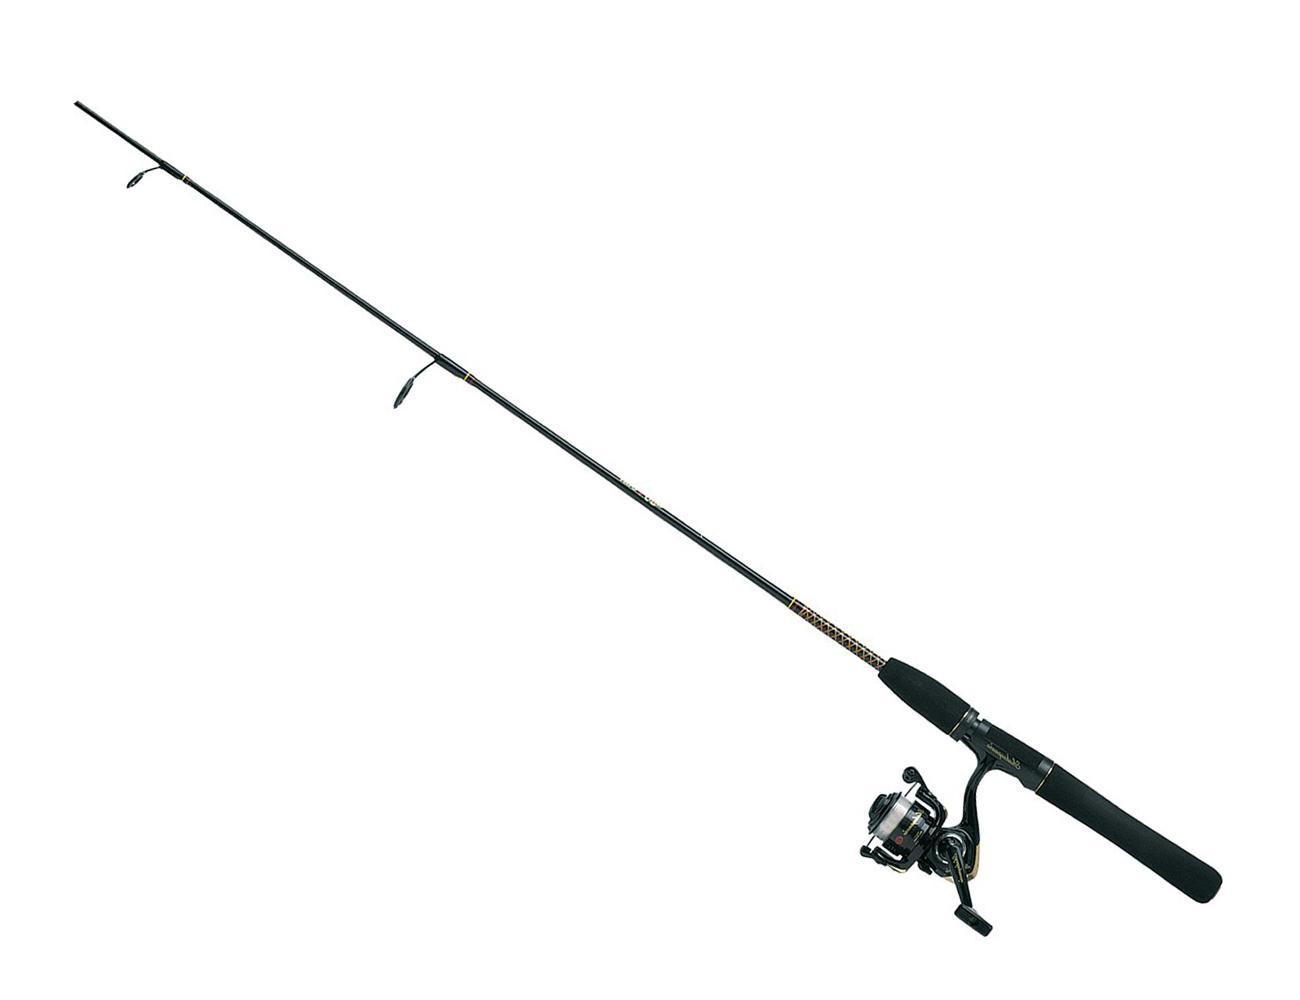 102+ Fishing Pole Clipart.